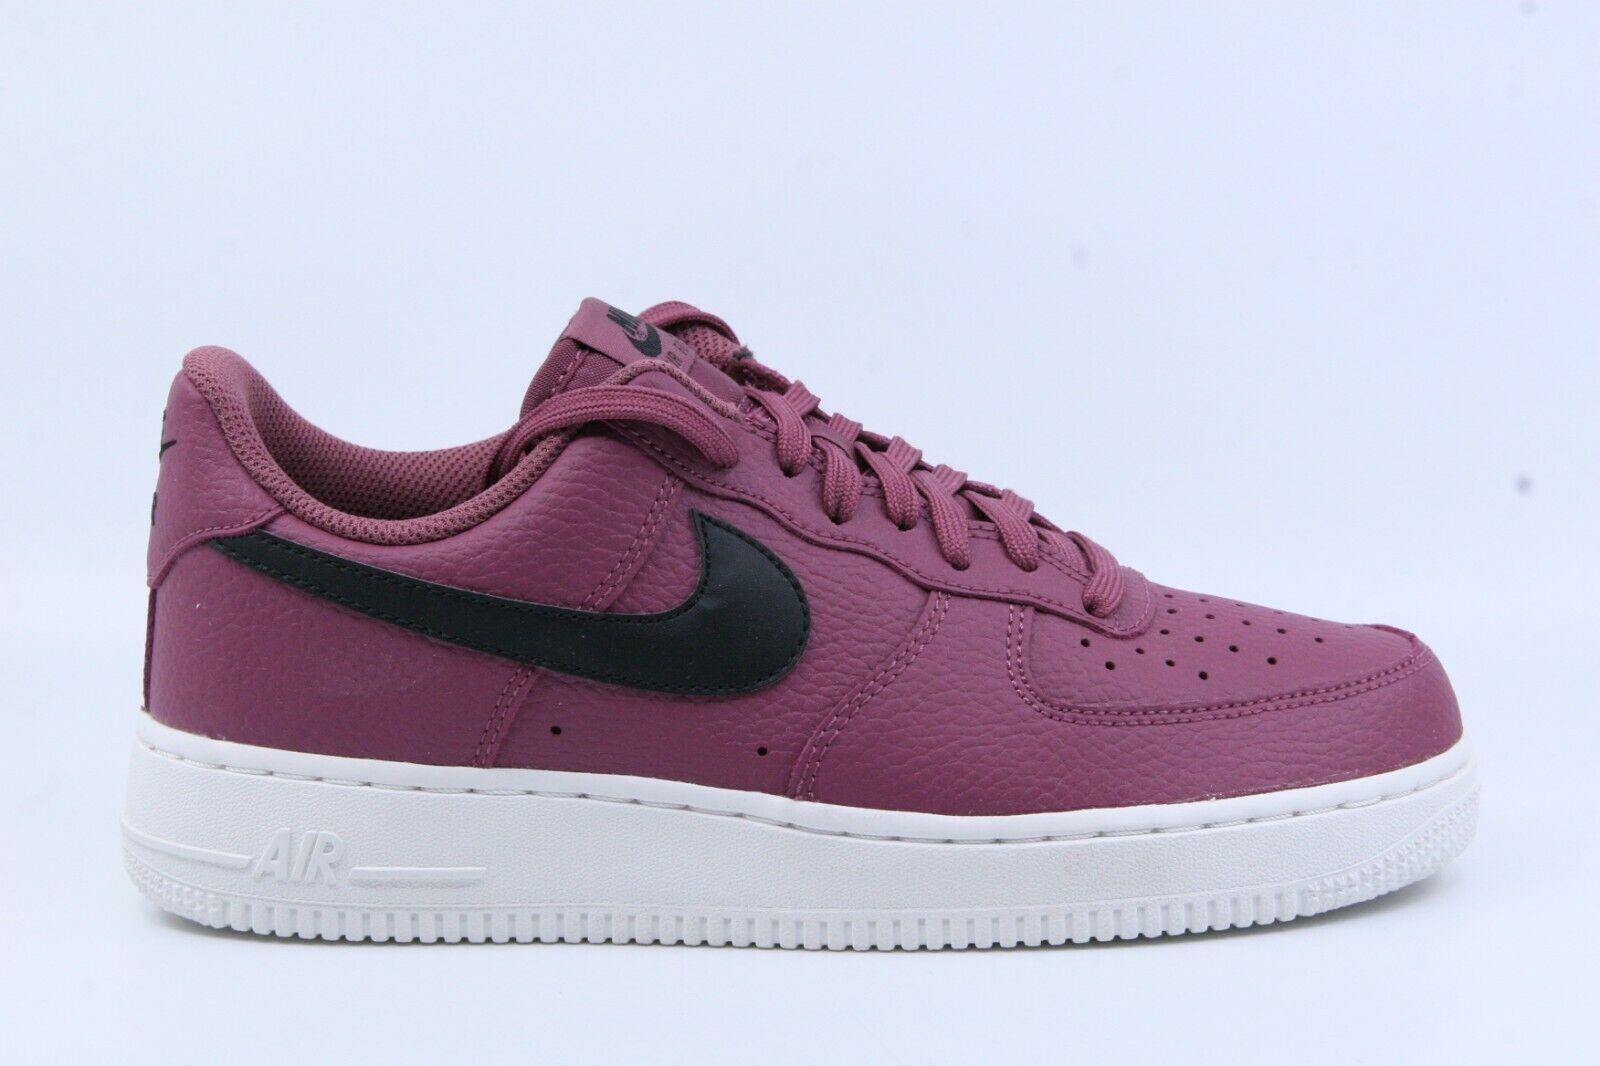 Nike Men's Air Force 1 '07 Purple US8 AA4083-601